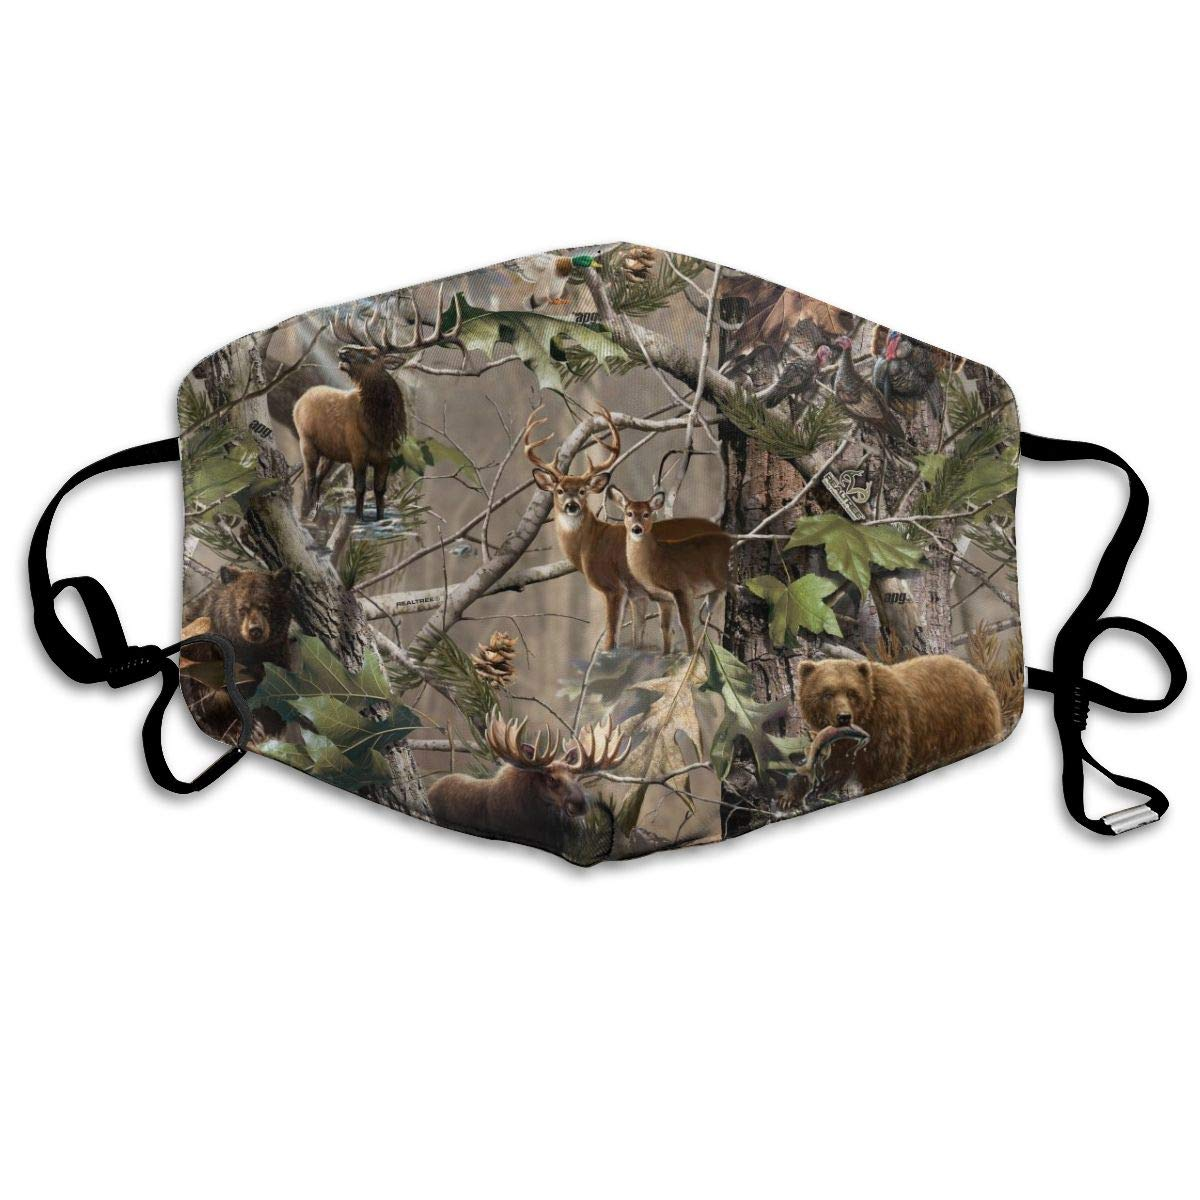 NiYoung Ideal Gift - Women Men Boys Girls Dustproof Hunting Camo Moose Deer Bear Fish Forest Animal Pattern Half Face Mouth Mask